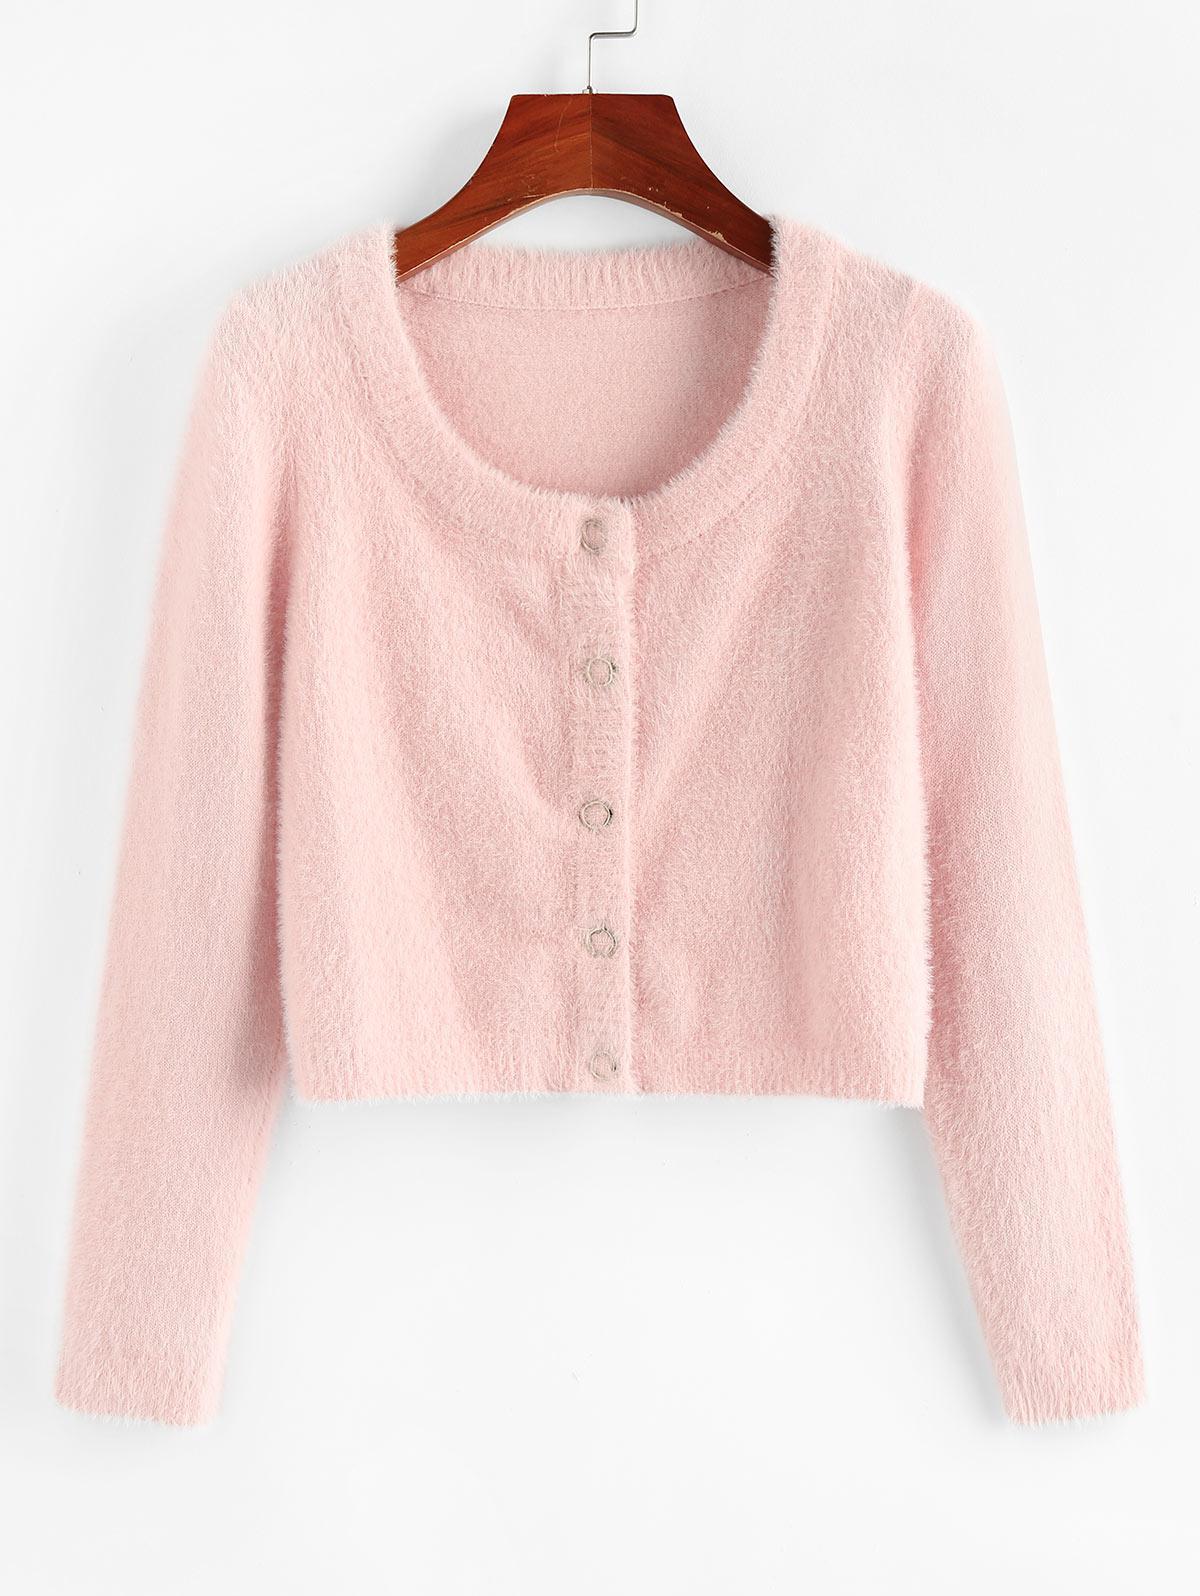 ZAFUL Fuzzy Knit Snap Button Boxy Cardigan